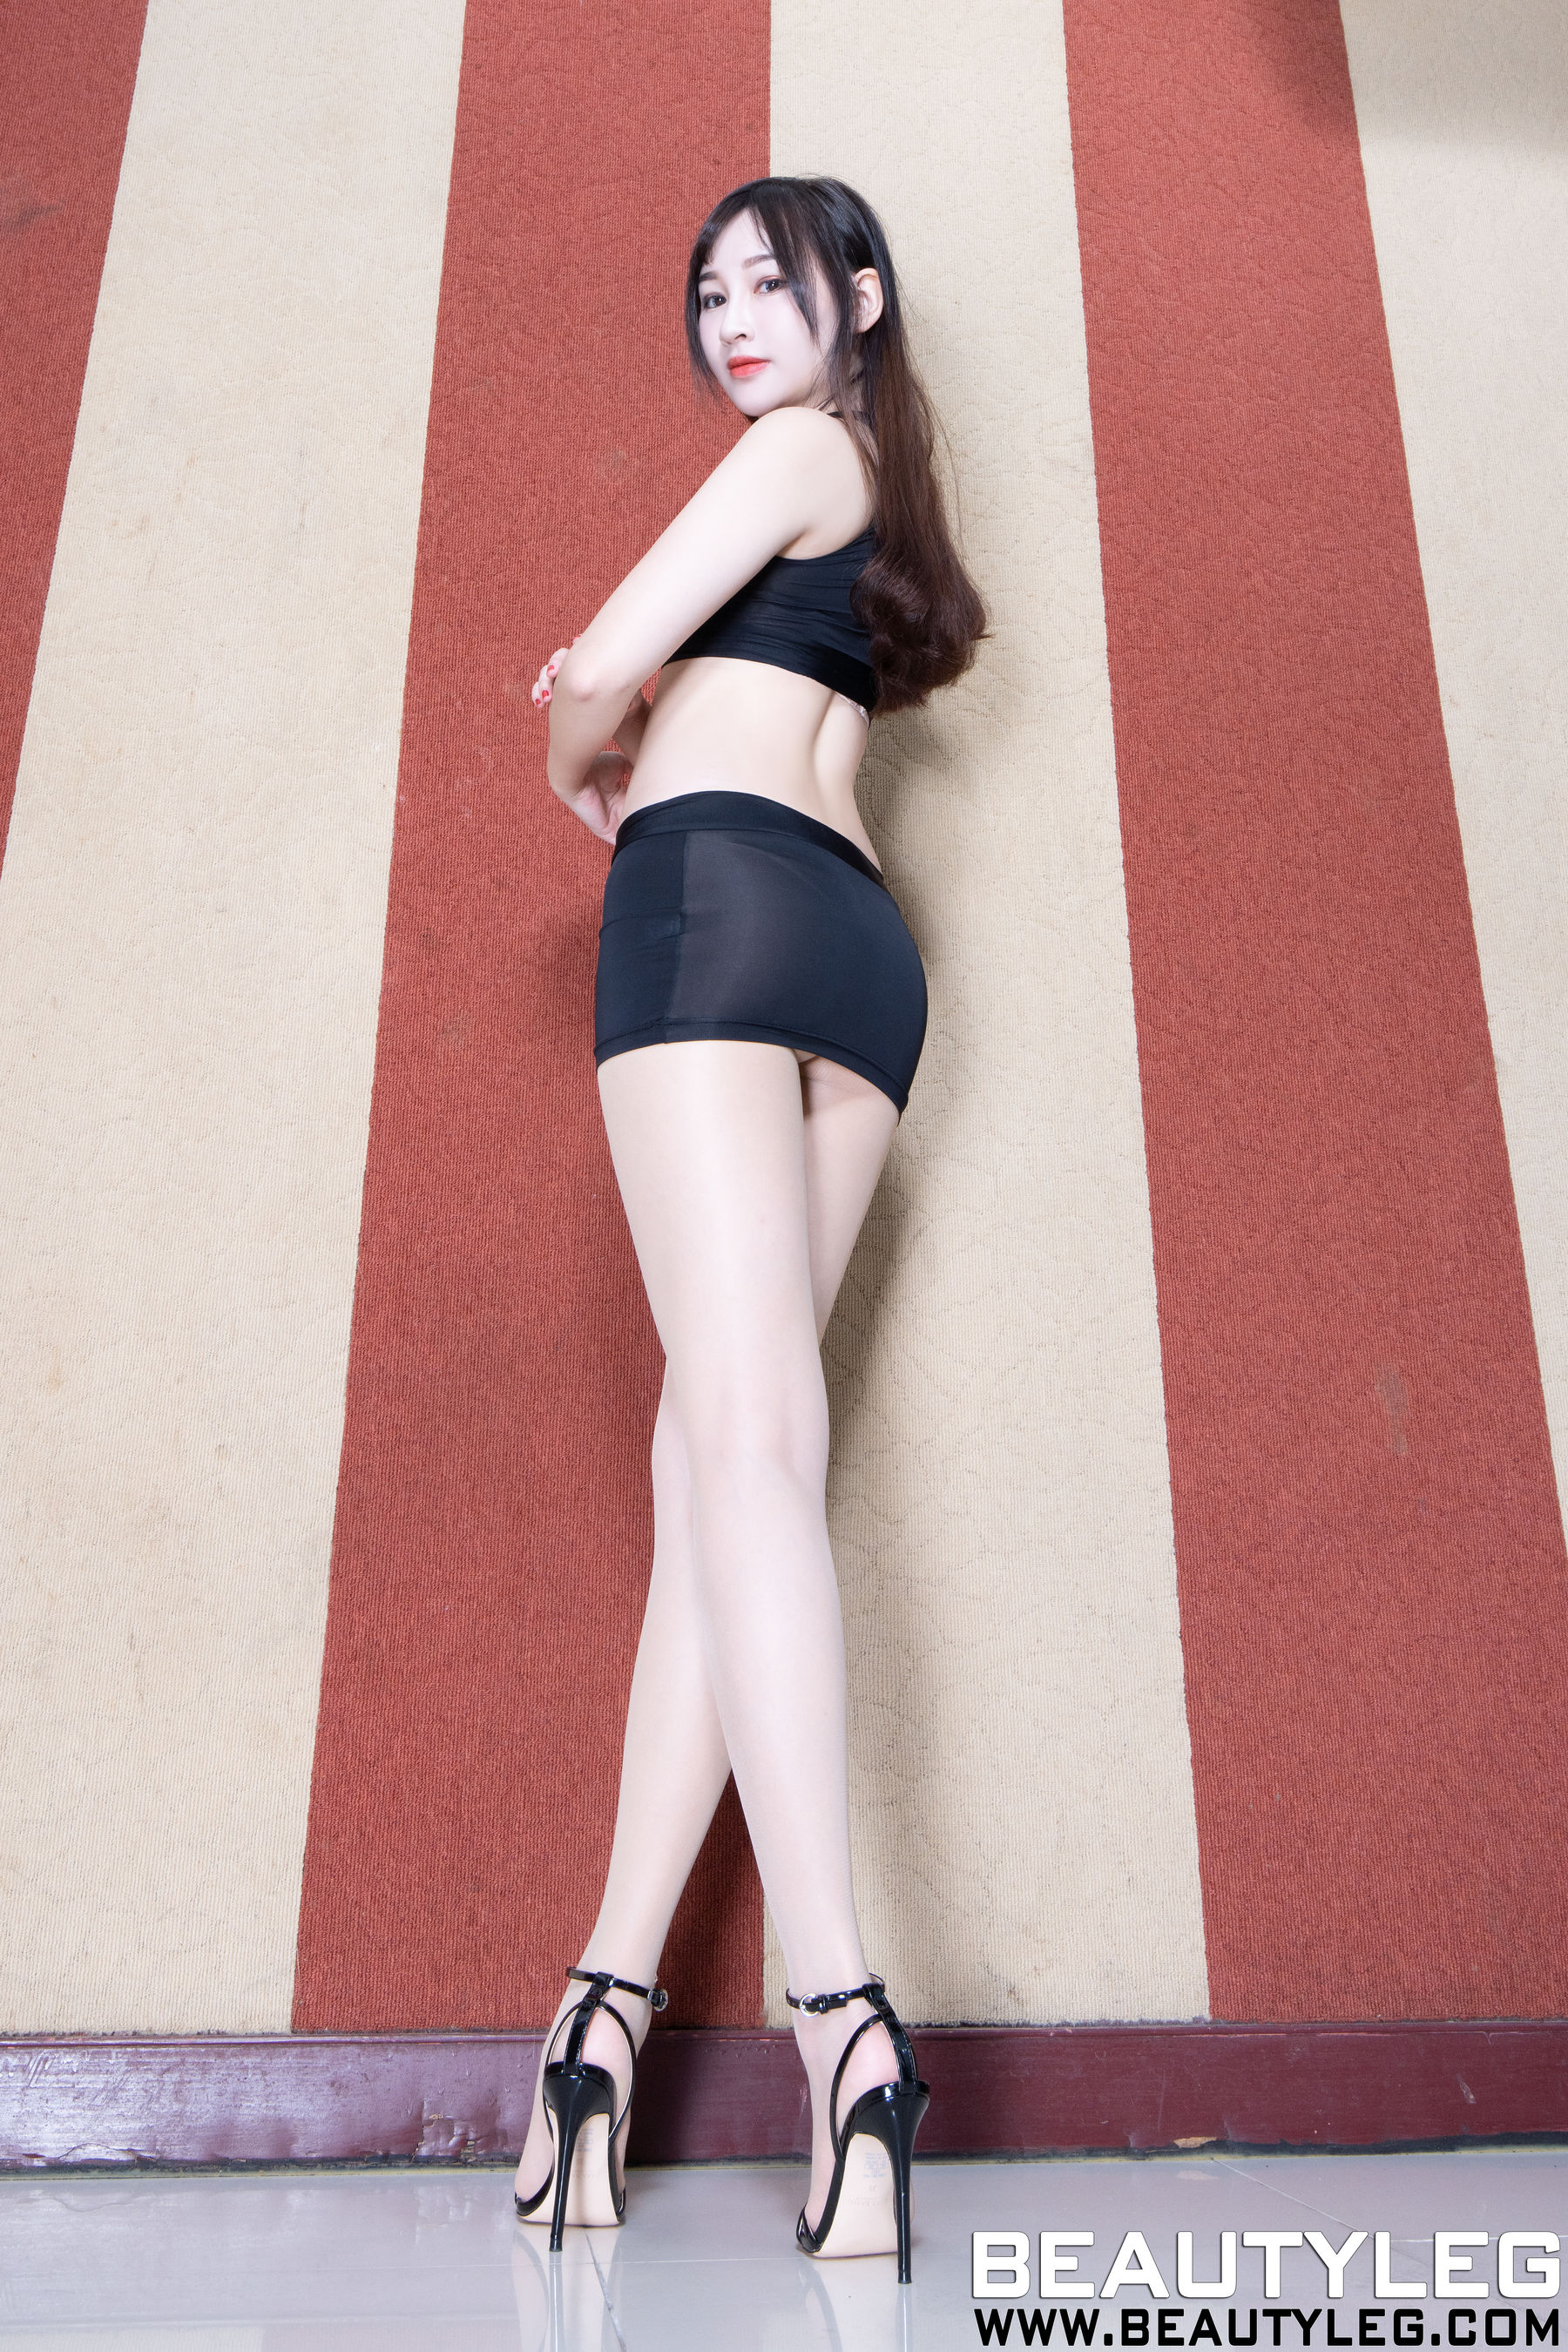 VOL.1567 [Beautyleg]肉丝袜长腿美女:腿模ChiChi超高清个人性感漂亮大图(43P)